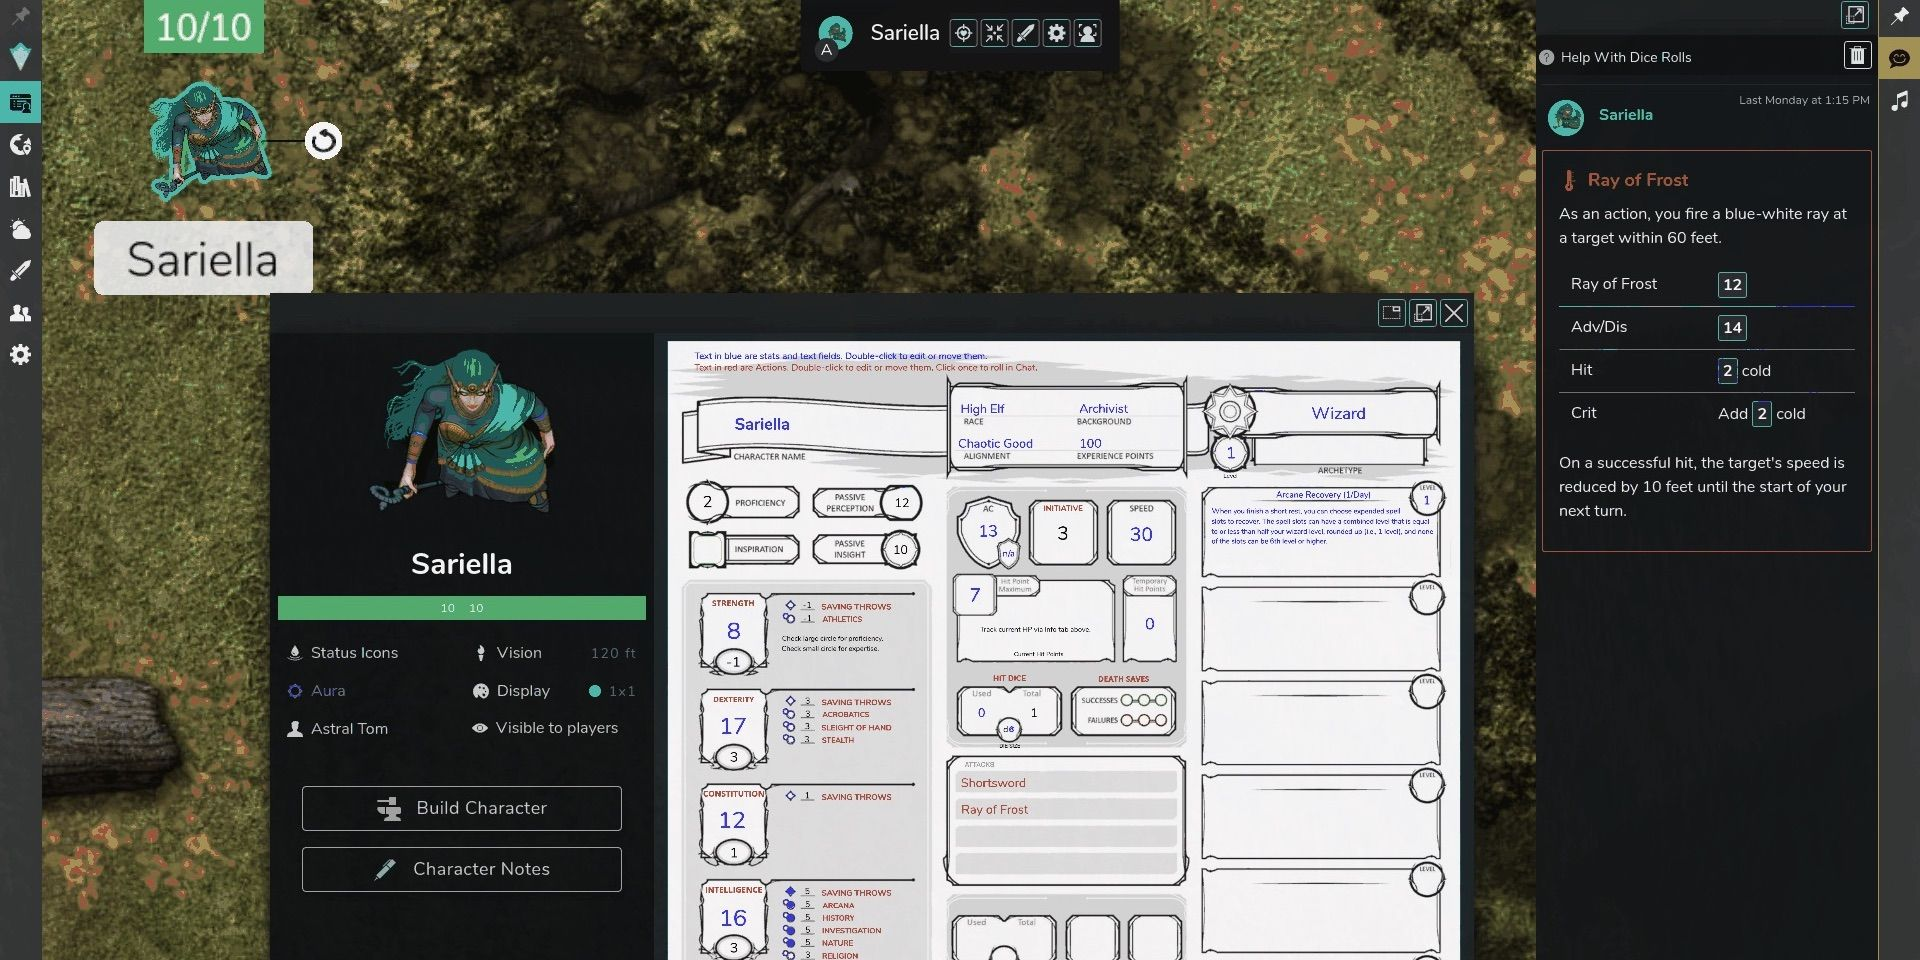 Beginner Friendly Tabletop Rpgs For People Looking To Play Online